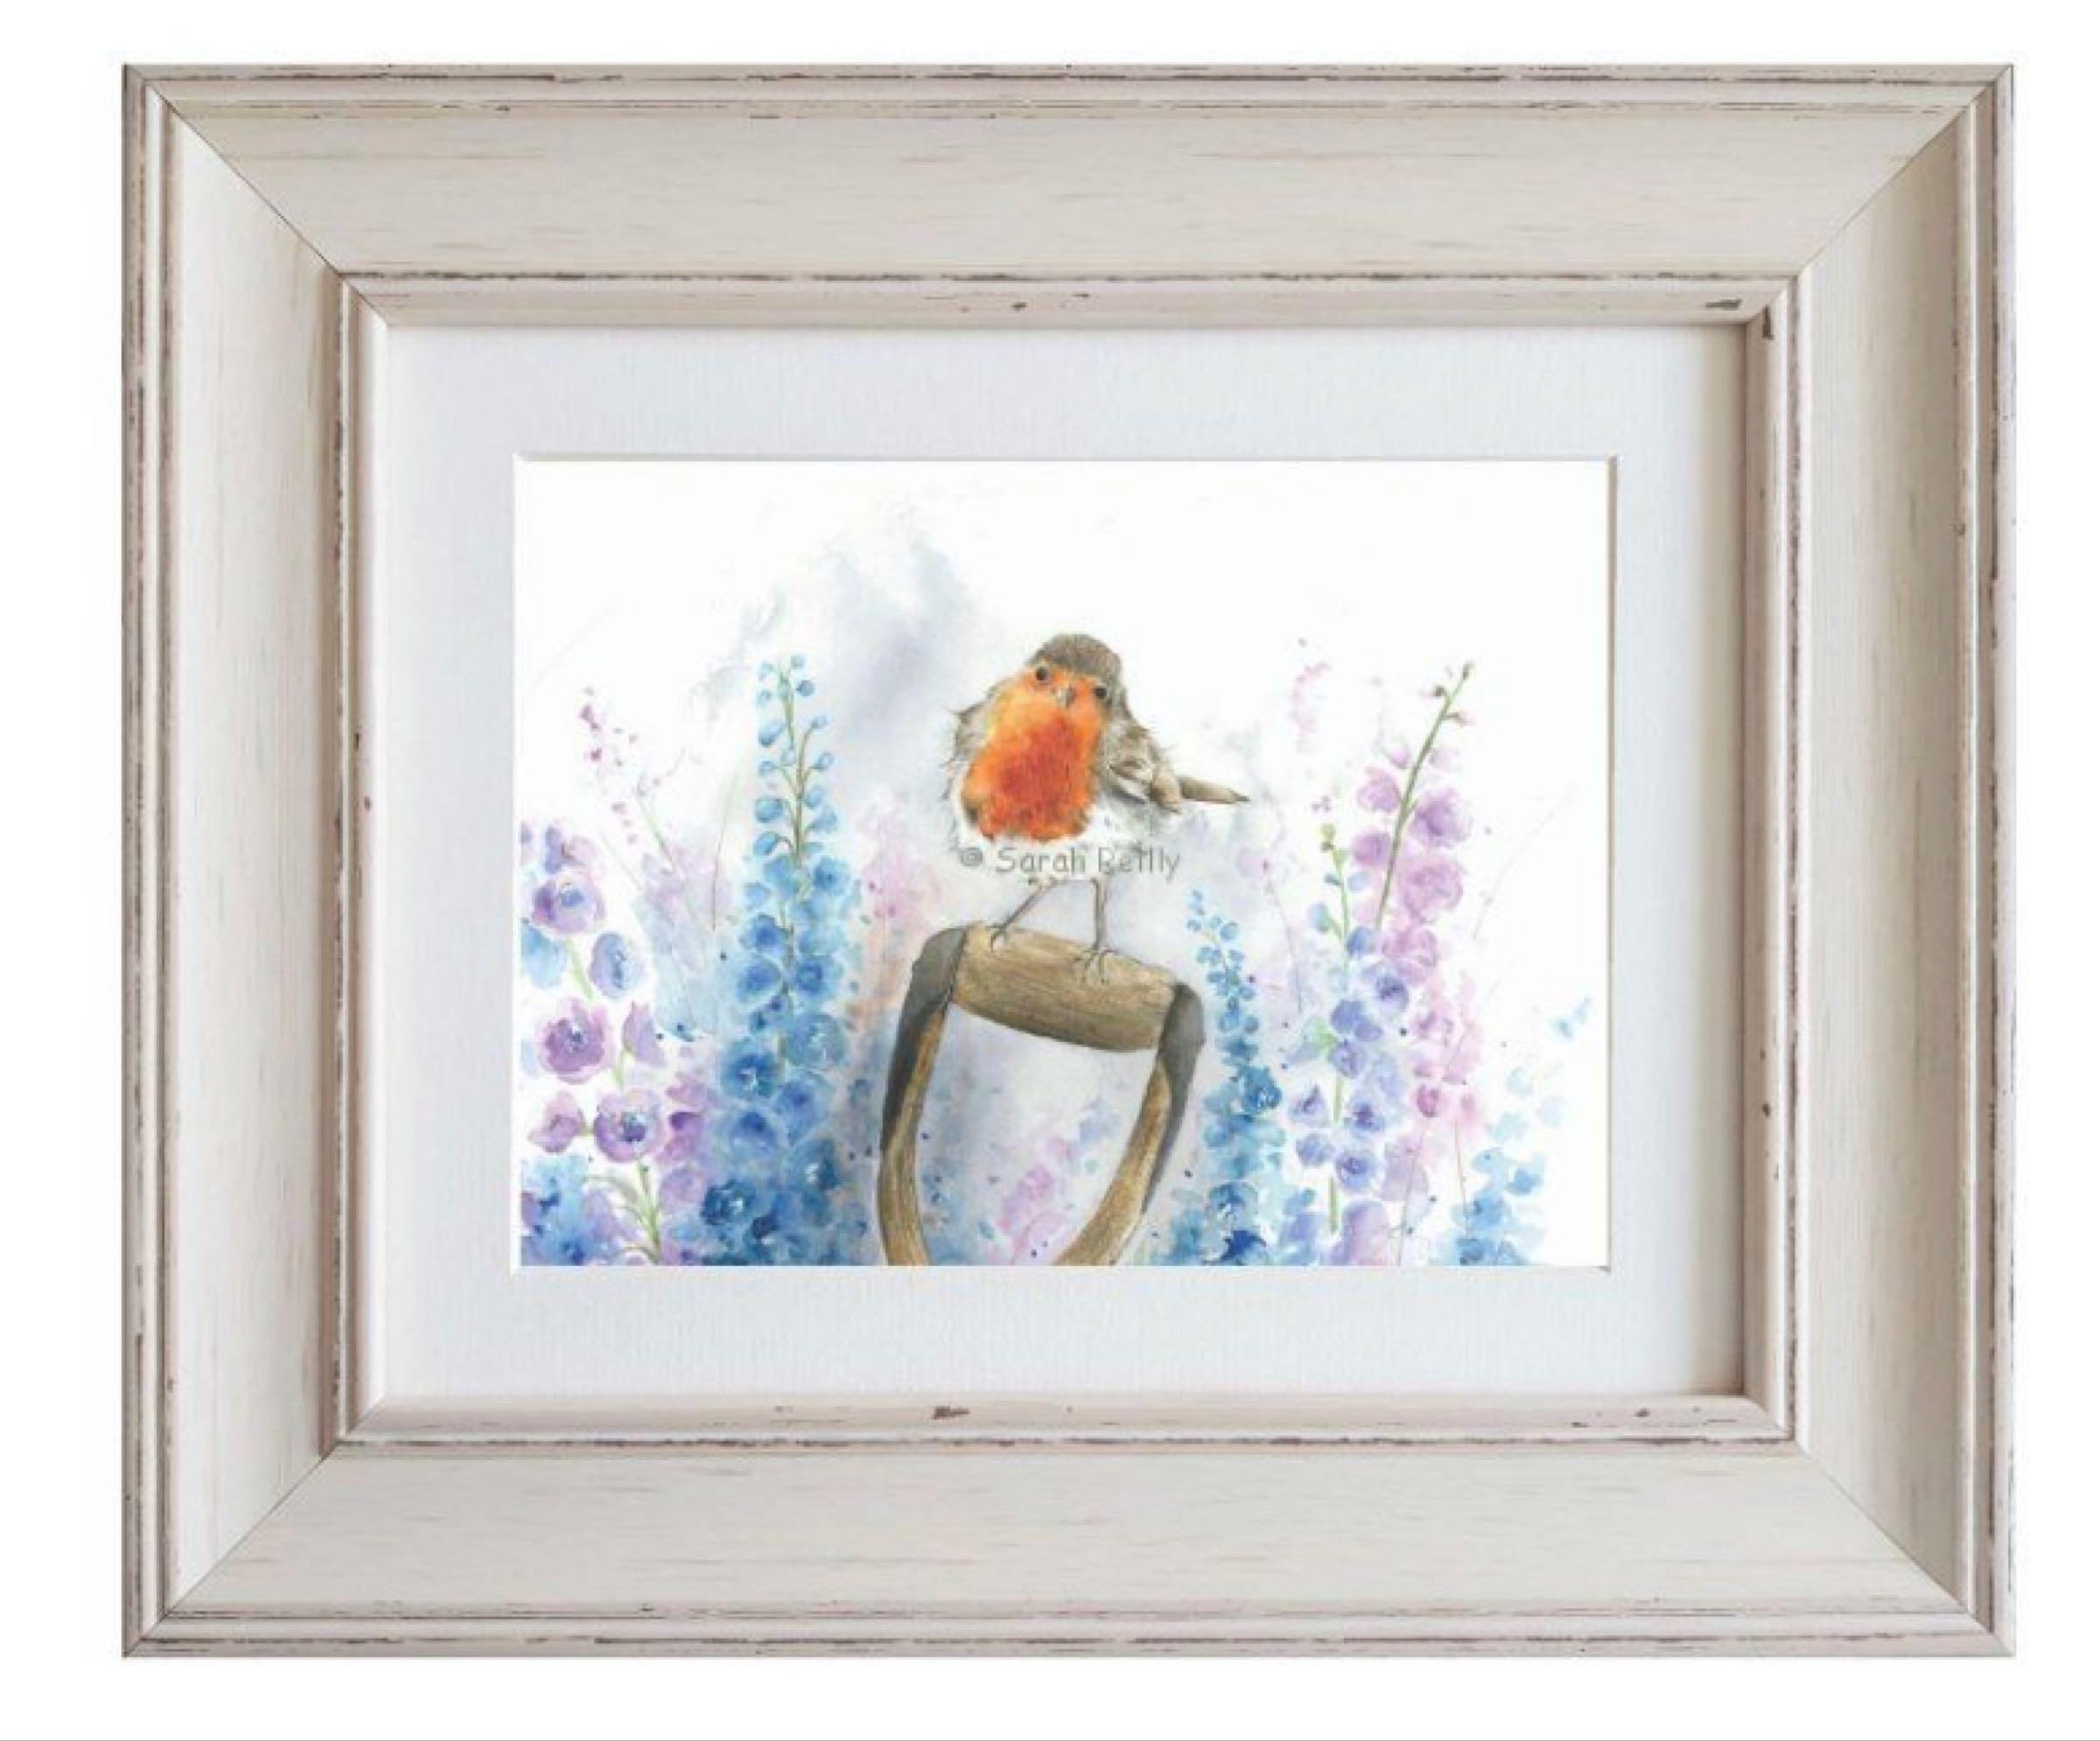 Rosie Robin Framed Print by Sarah Reilly 28cmx33cm